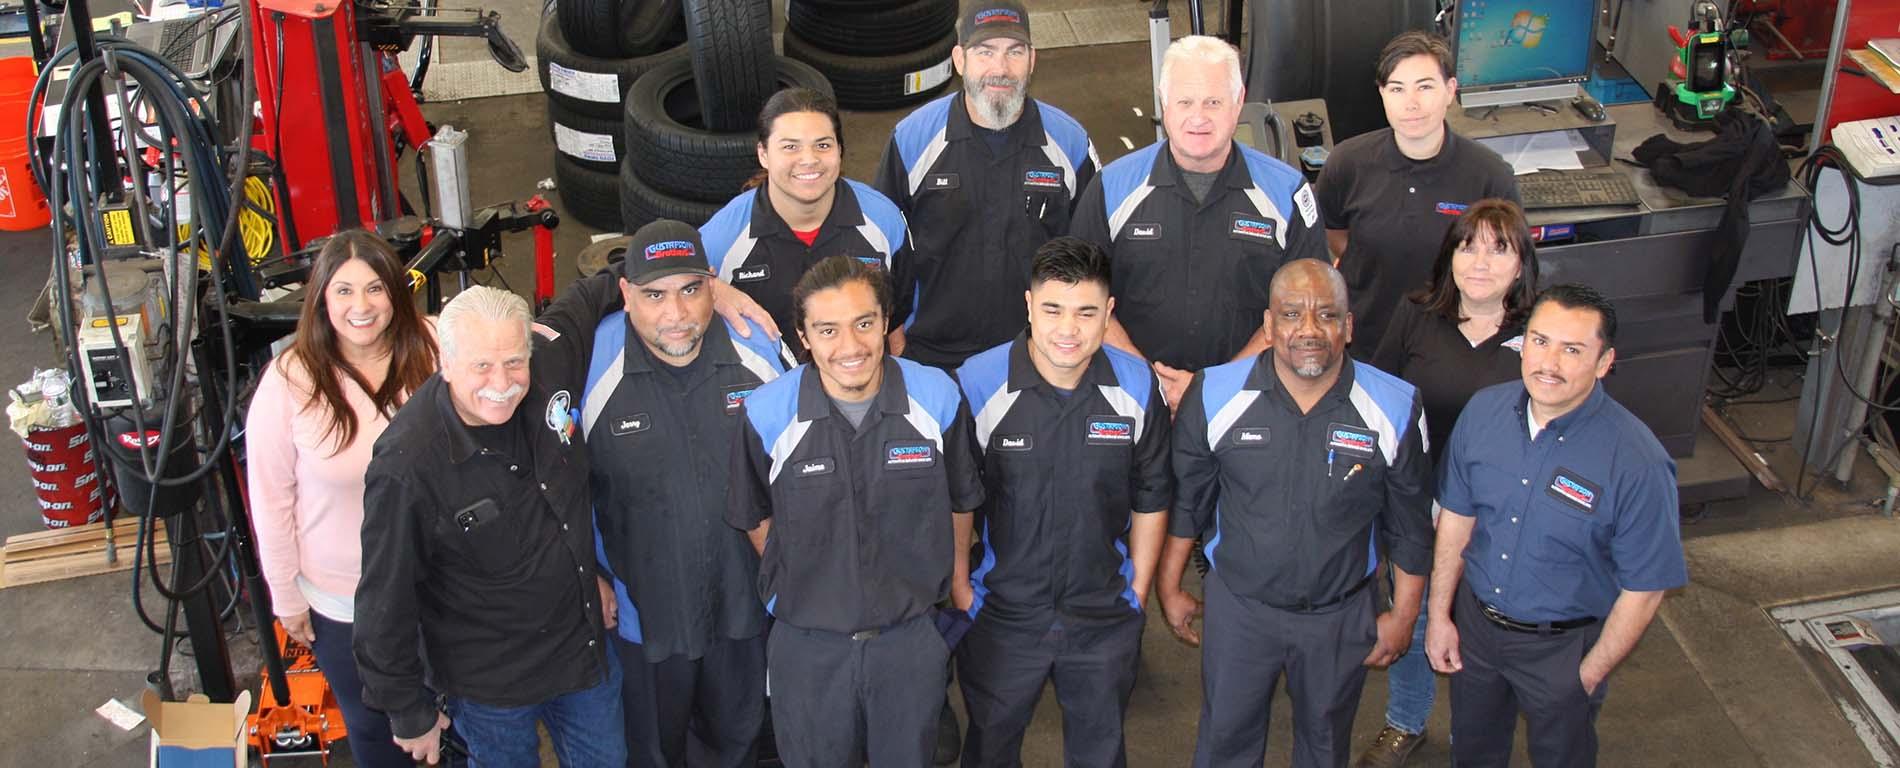 gustafson brothers huntington beach auto repair auto body shop employment.